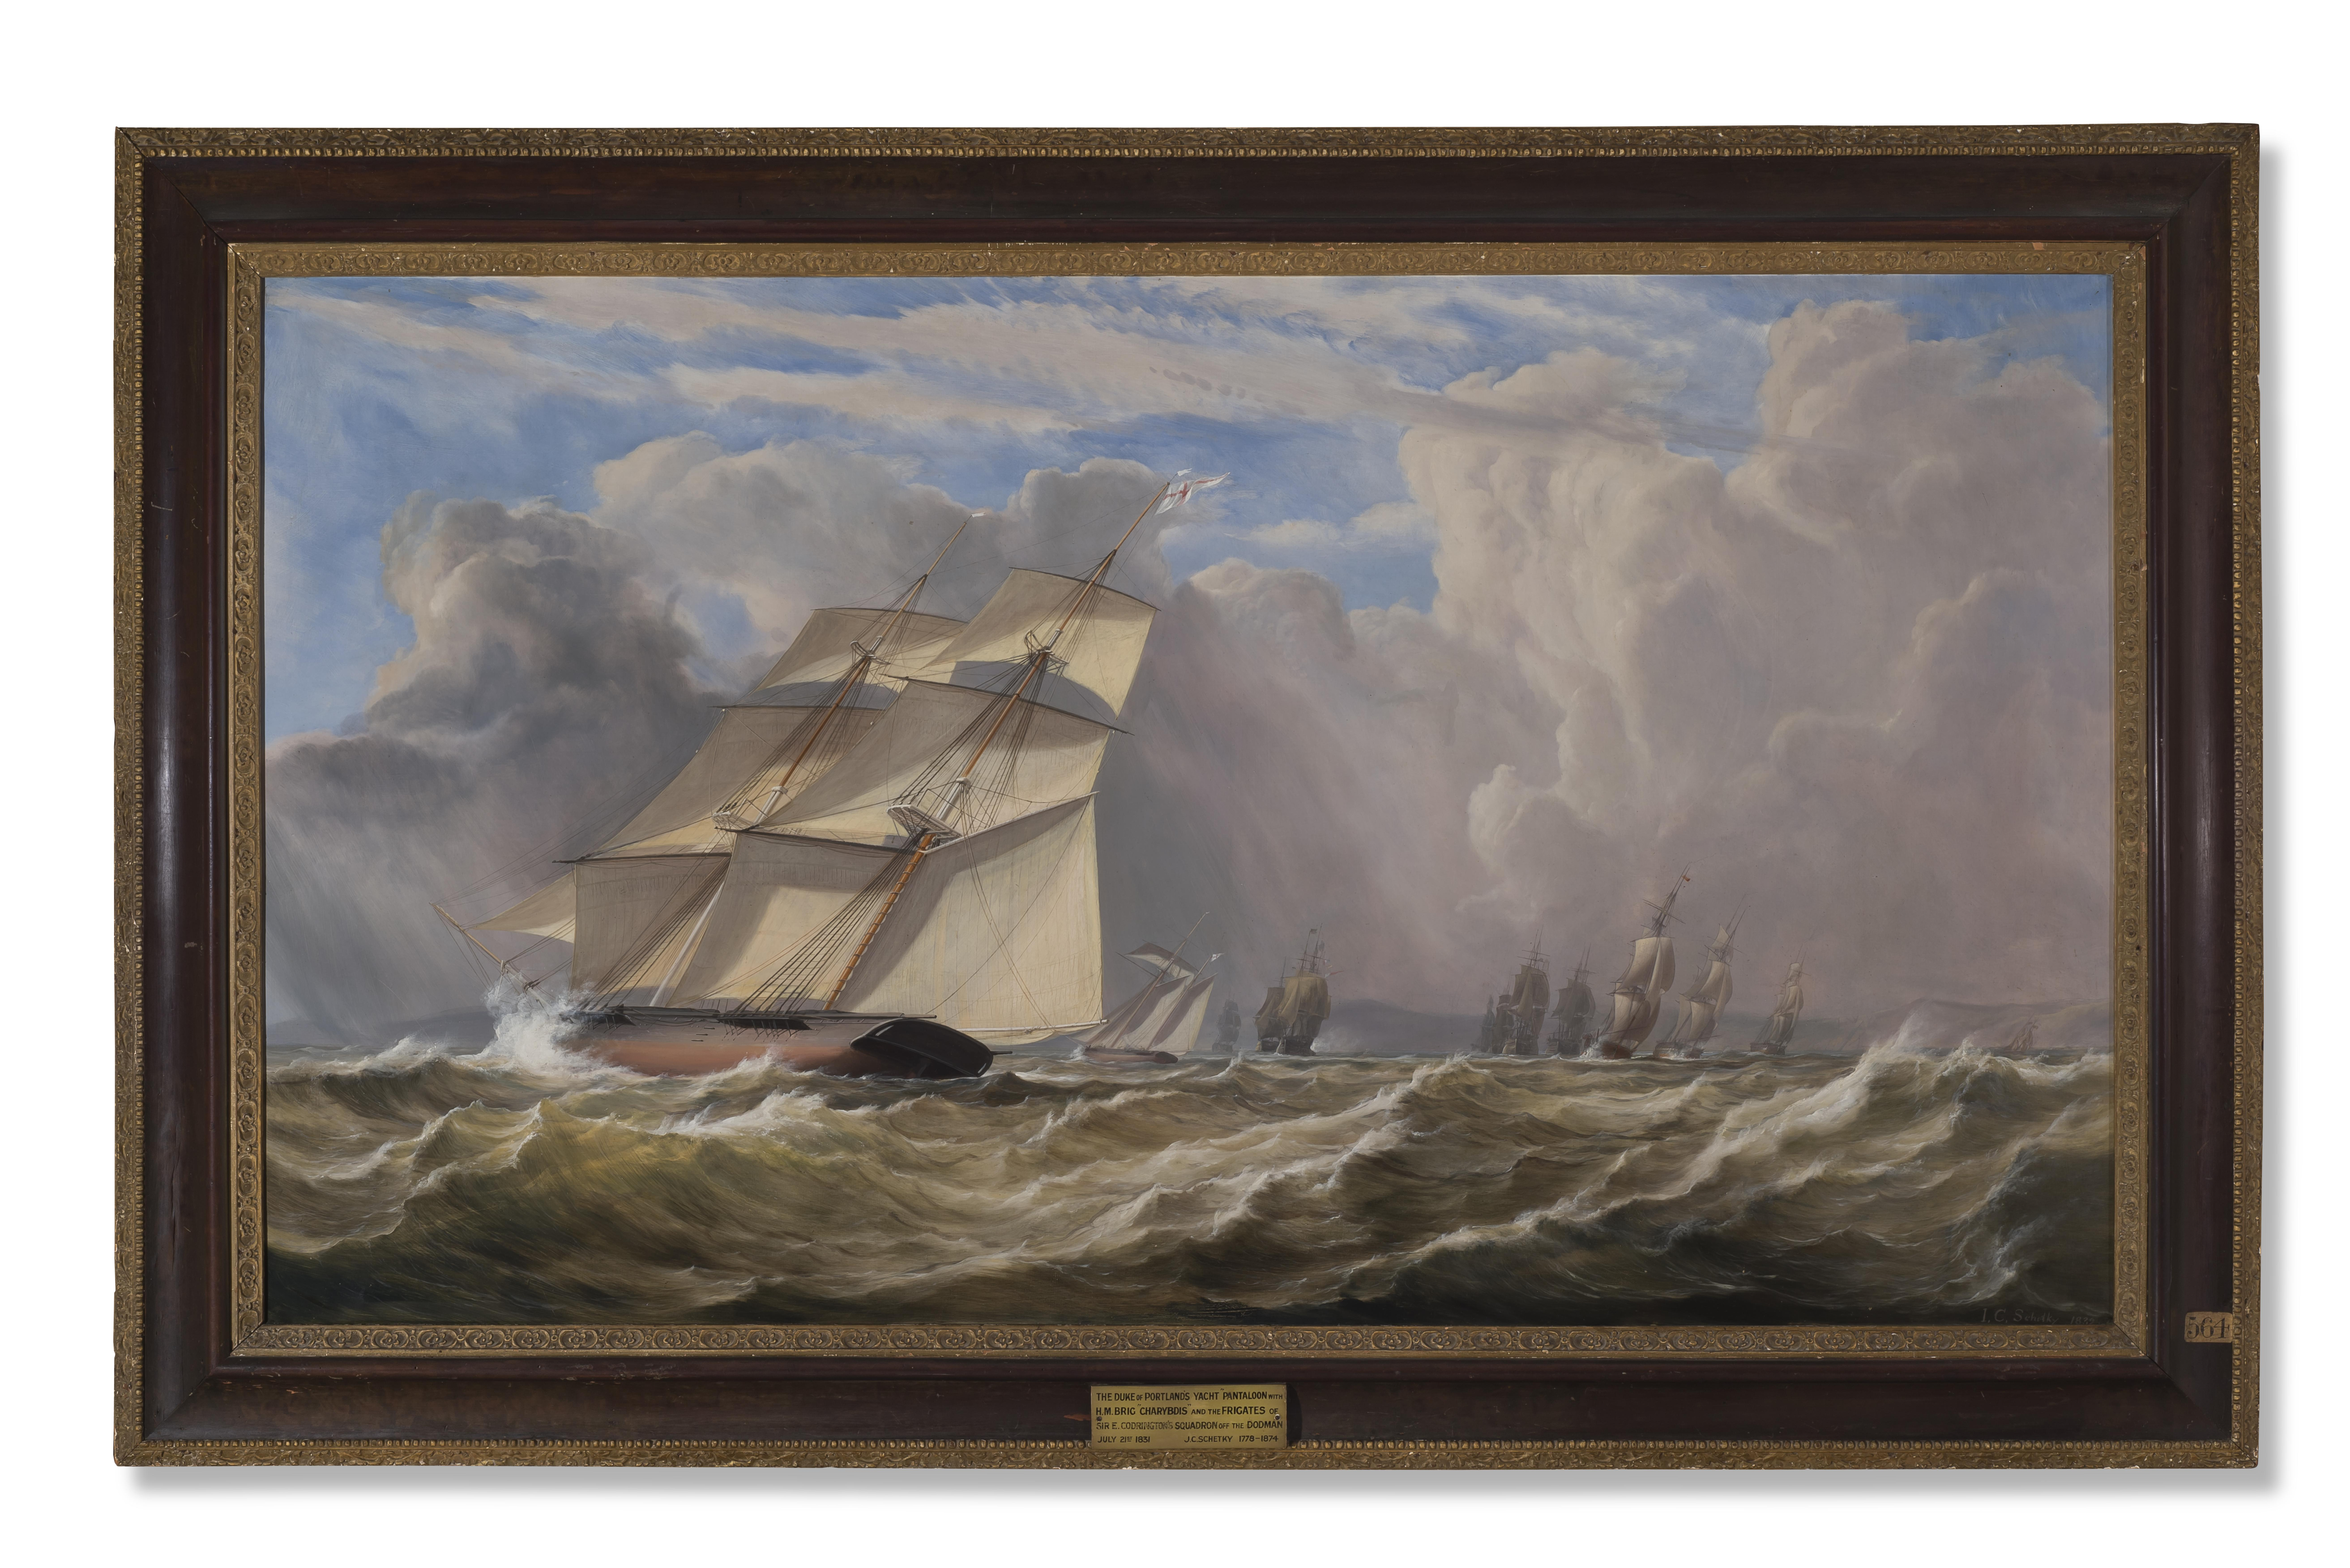 The Duke of Portland's Brig 'Pantaloon' by J C Schetky